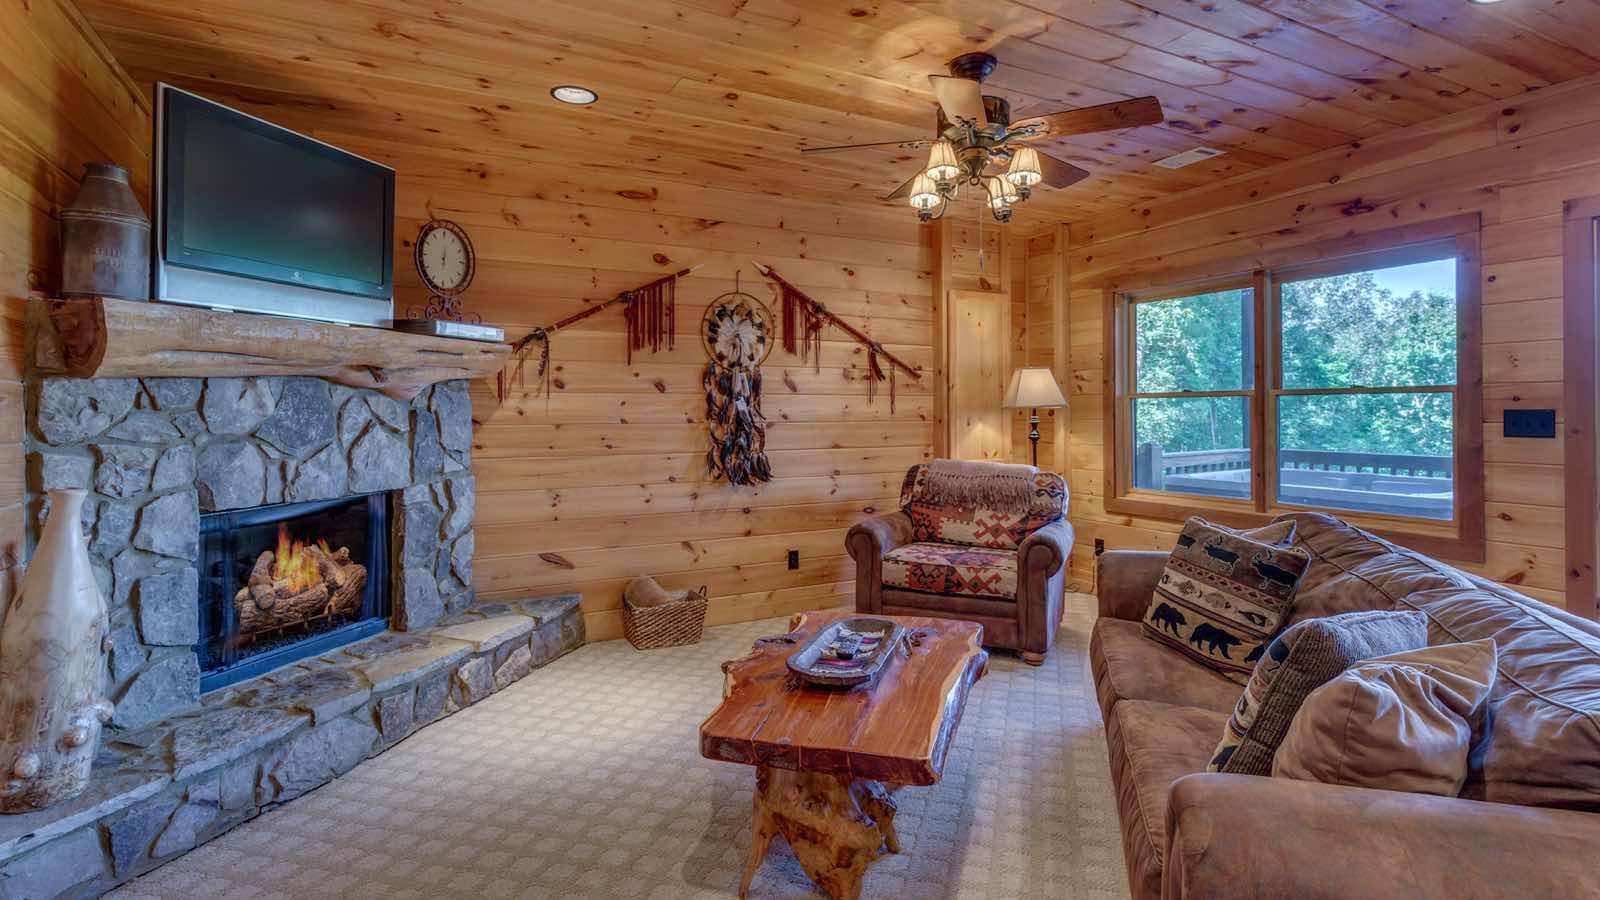 downtown blue ridge ga lodging accommodations On black bear cabin rental